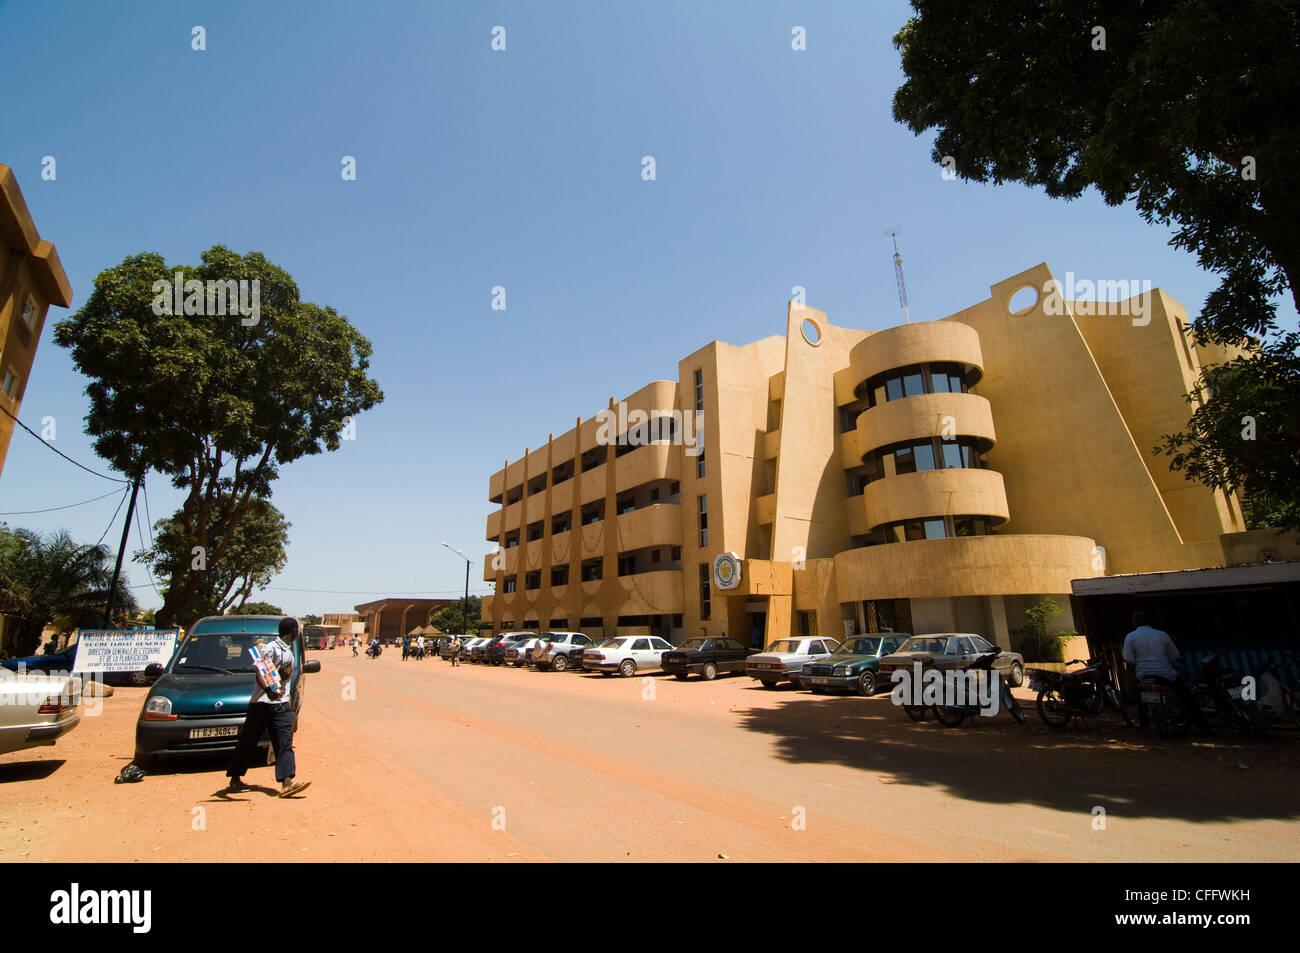 The Center Of Ouagadougou Capital Of Burkina Faso Stock Photo Alamy